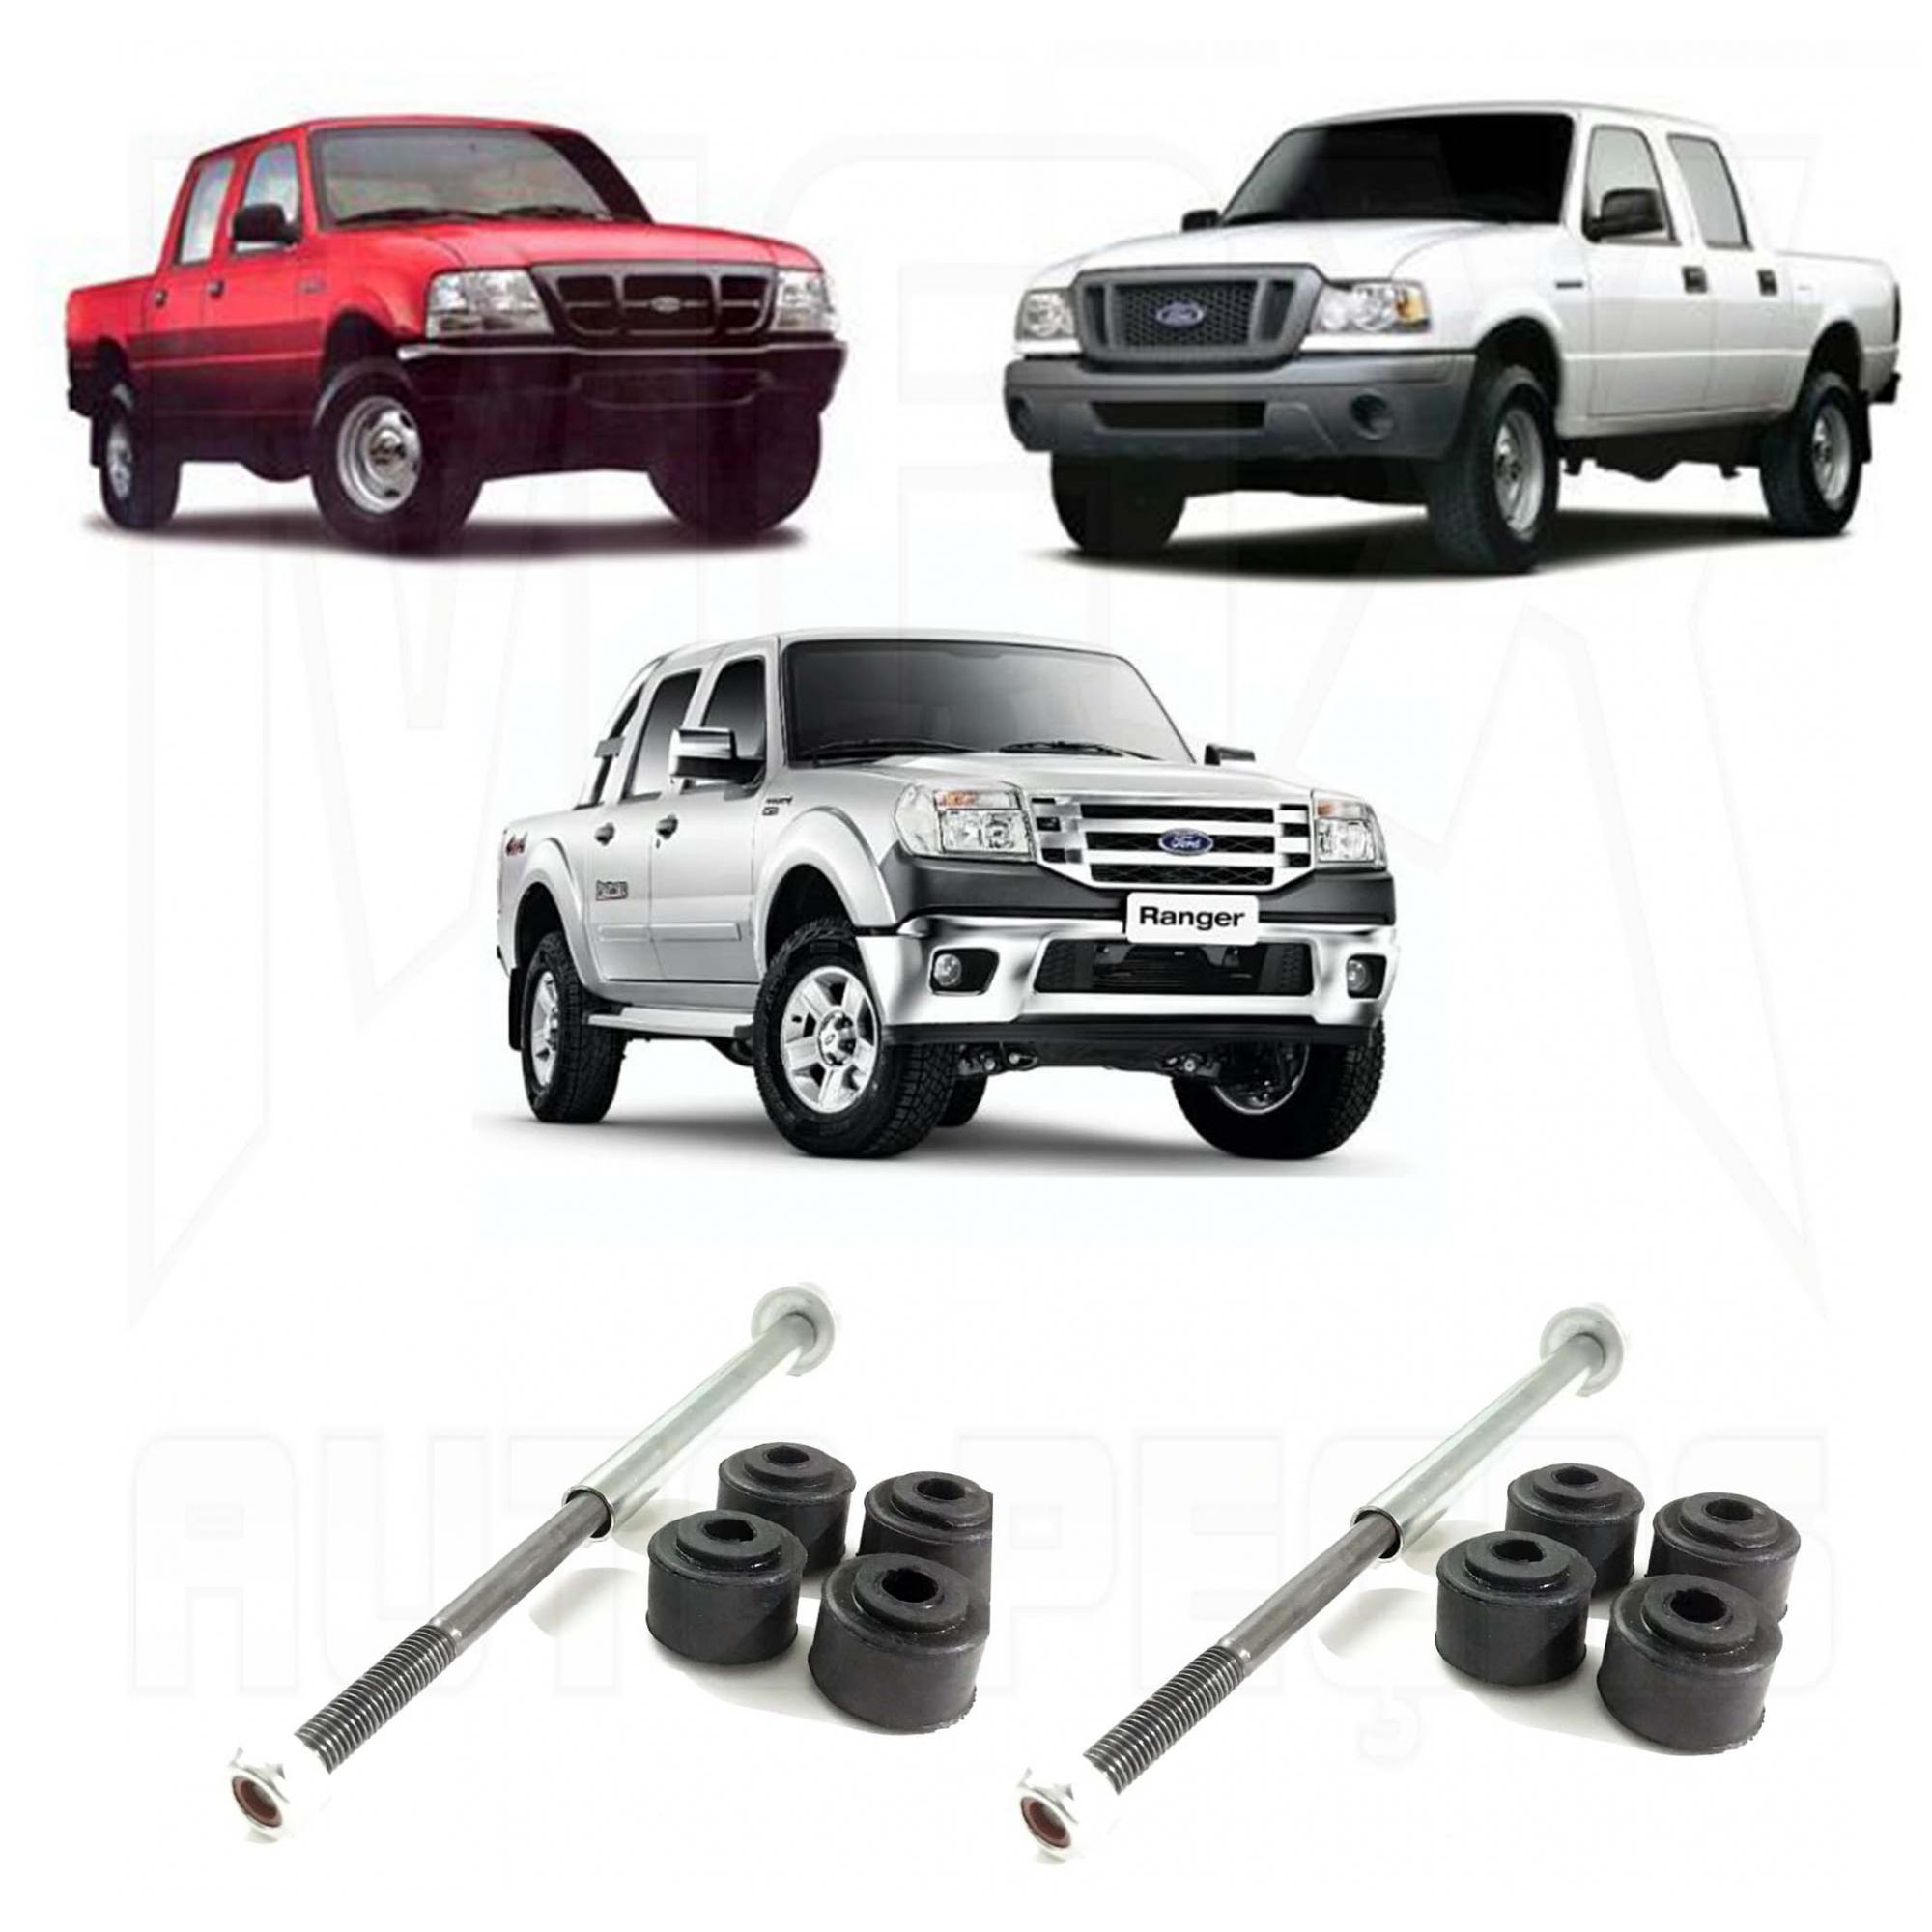 Kit Bieleta Dianteira Ranger 4x4 1997 1998 1999 2000 2001 2002 à 2012